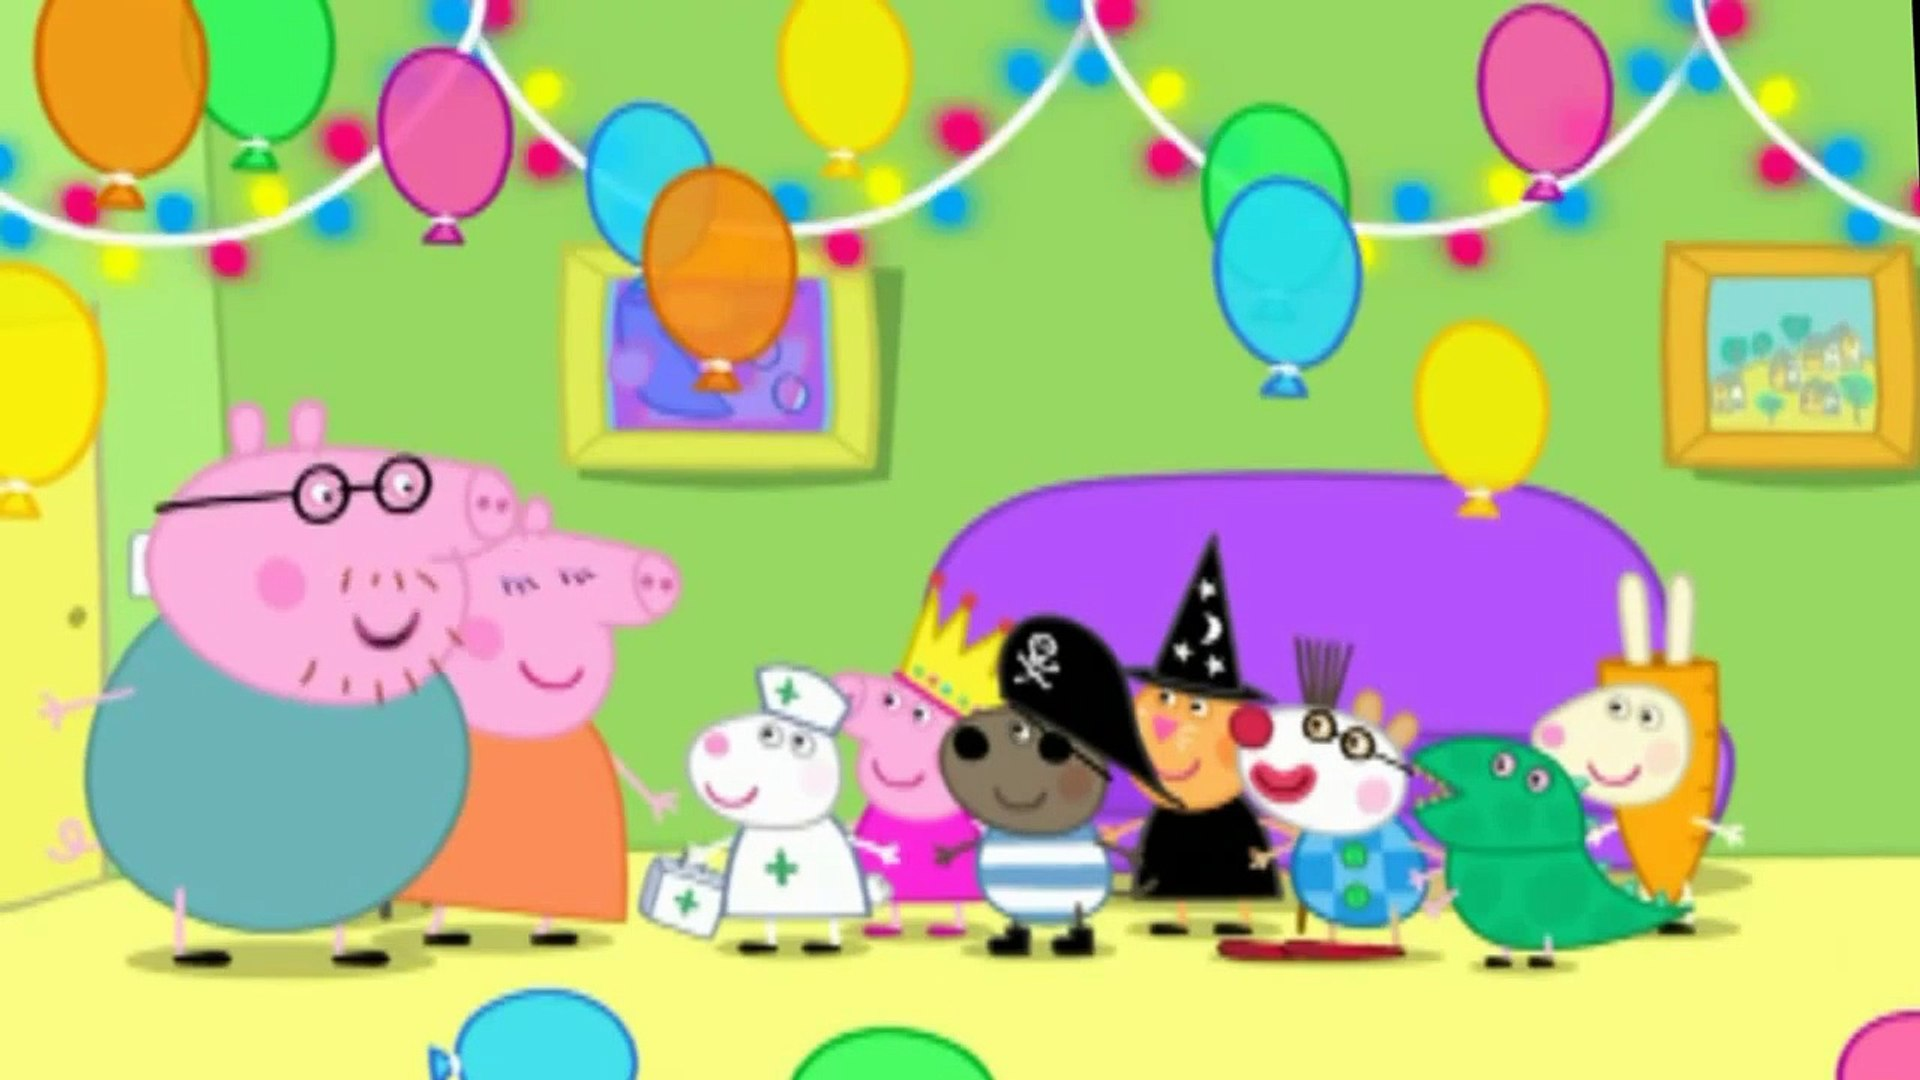 Peppa Pig English Episodes - Peppa Pig English Episodes